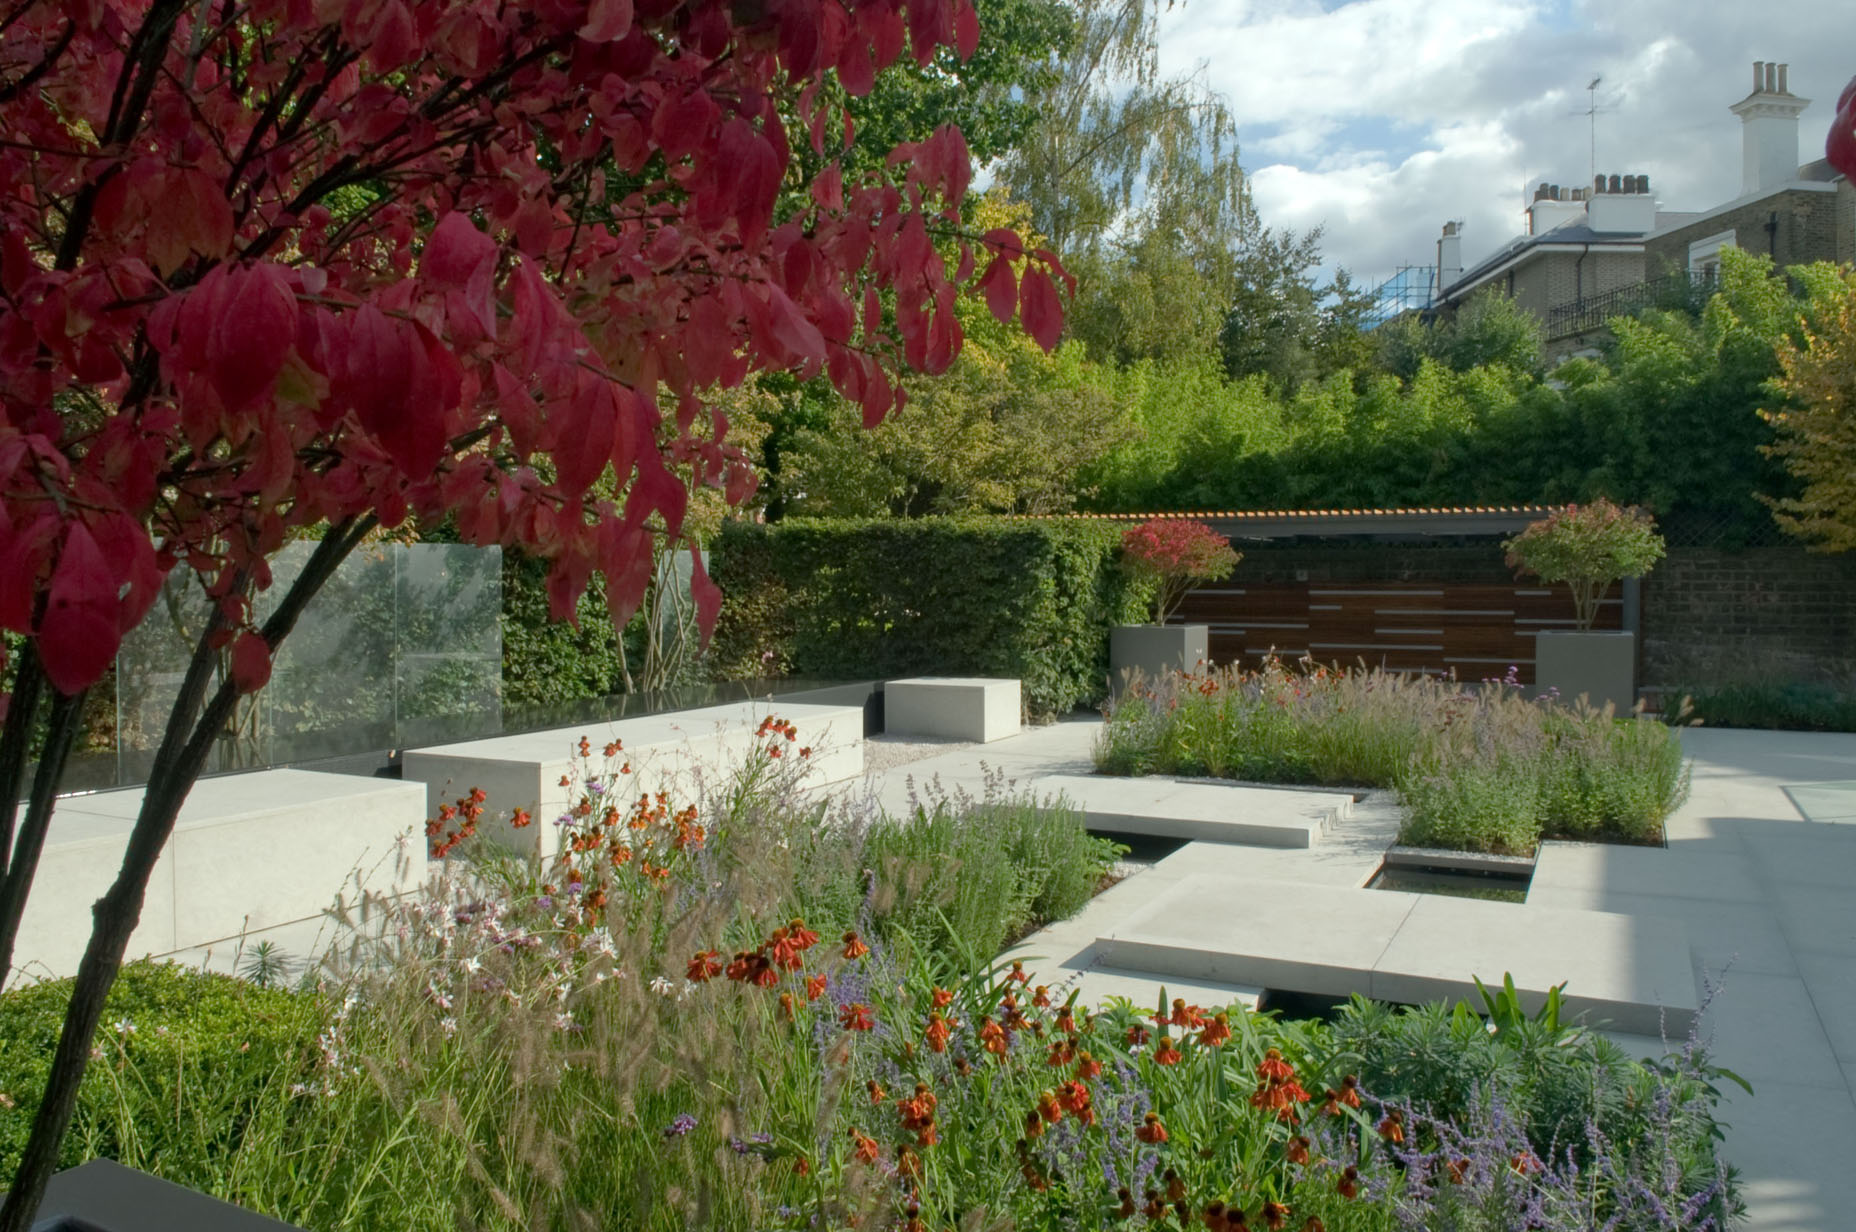 philip nixon design is a landscape architecture and garden design studio with a multidisciplinary and collaborative approach combining garden and landscape - Garden Architecture And Design